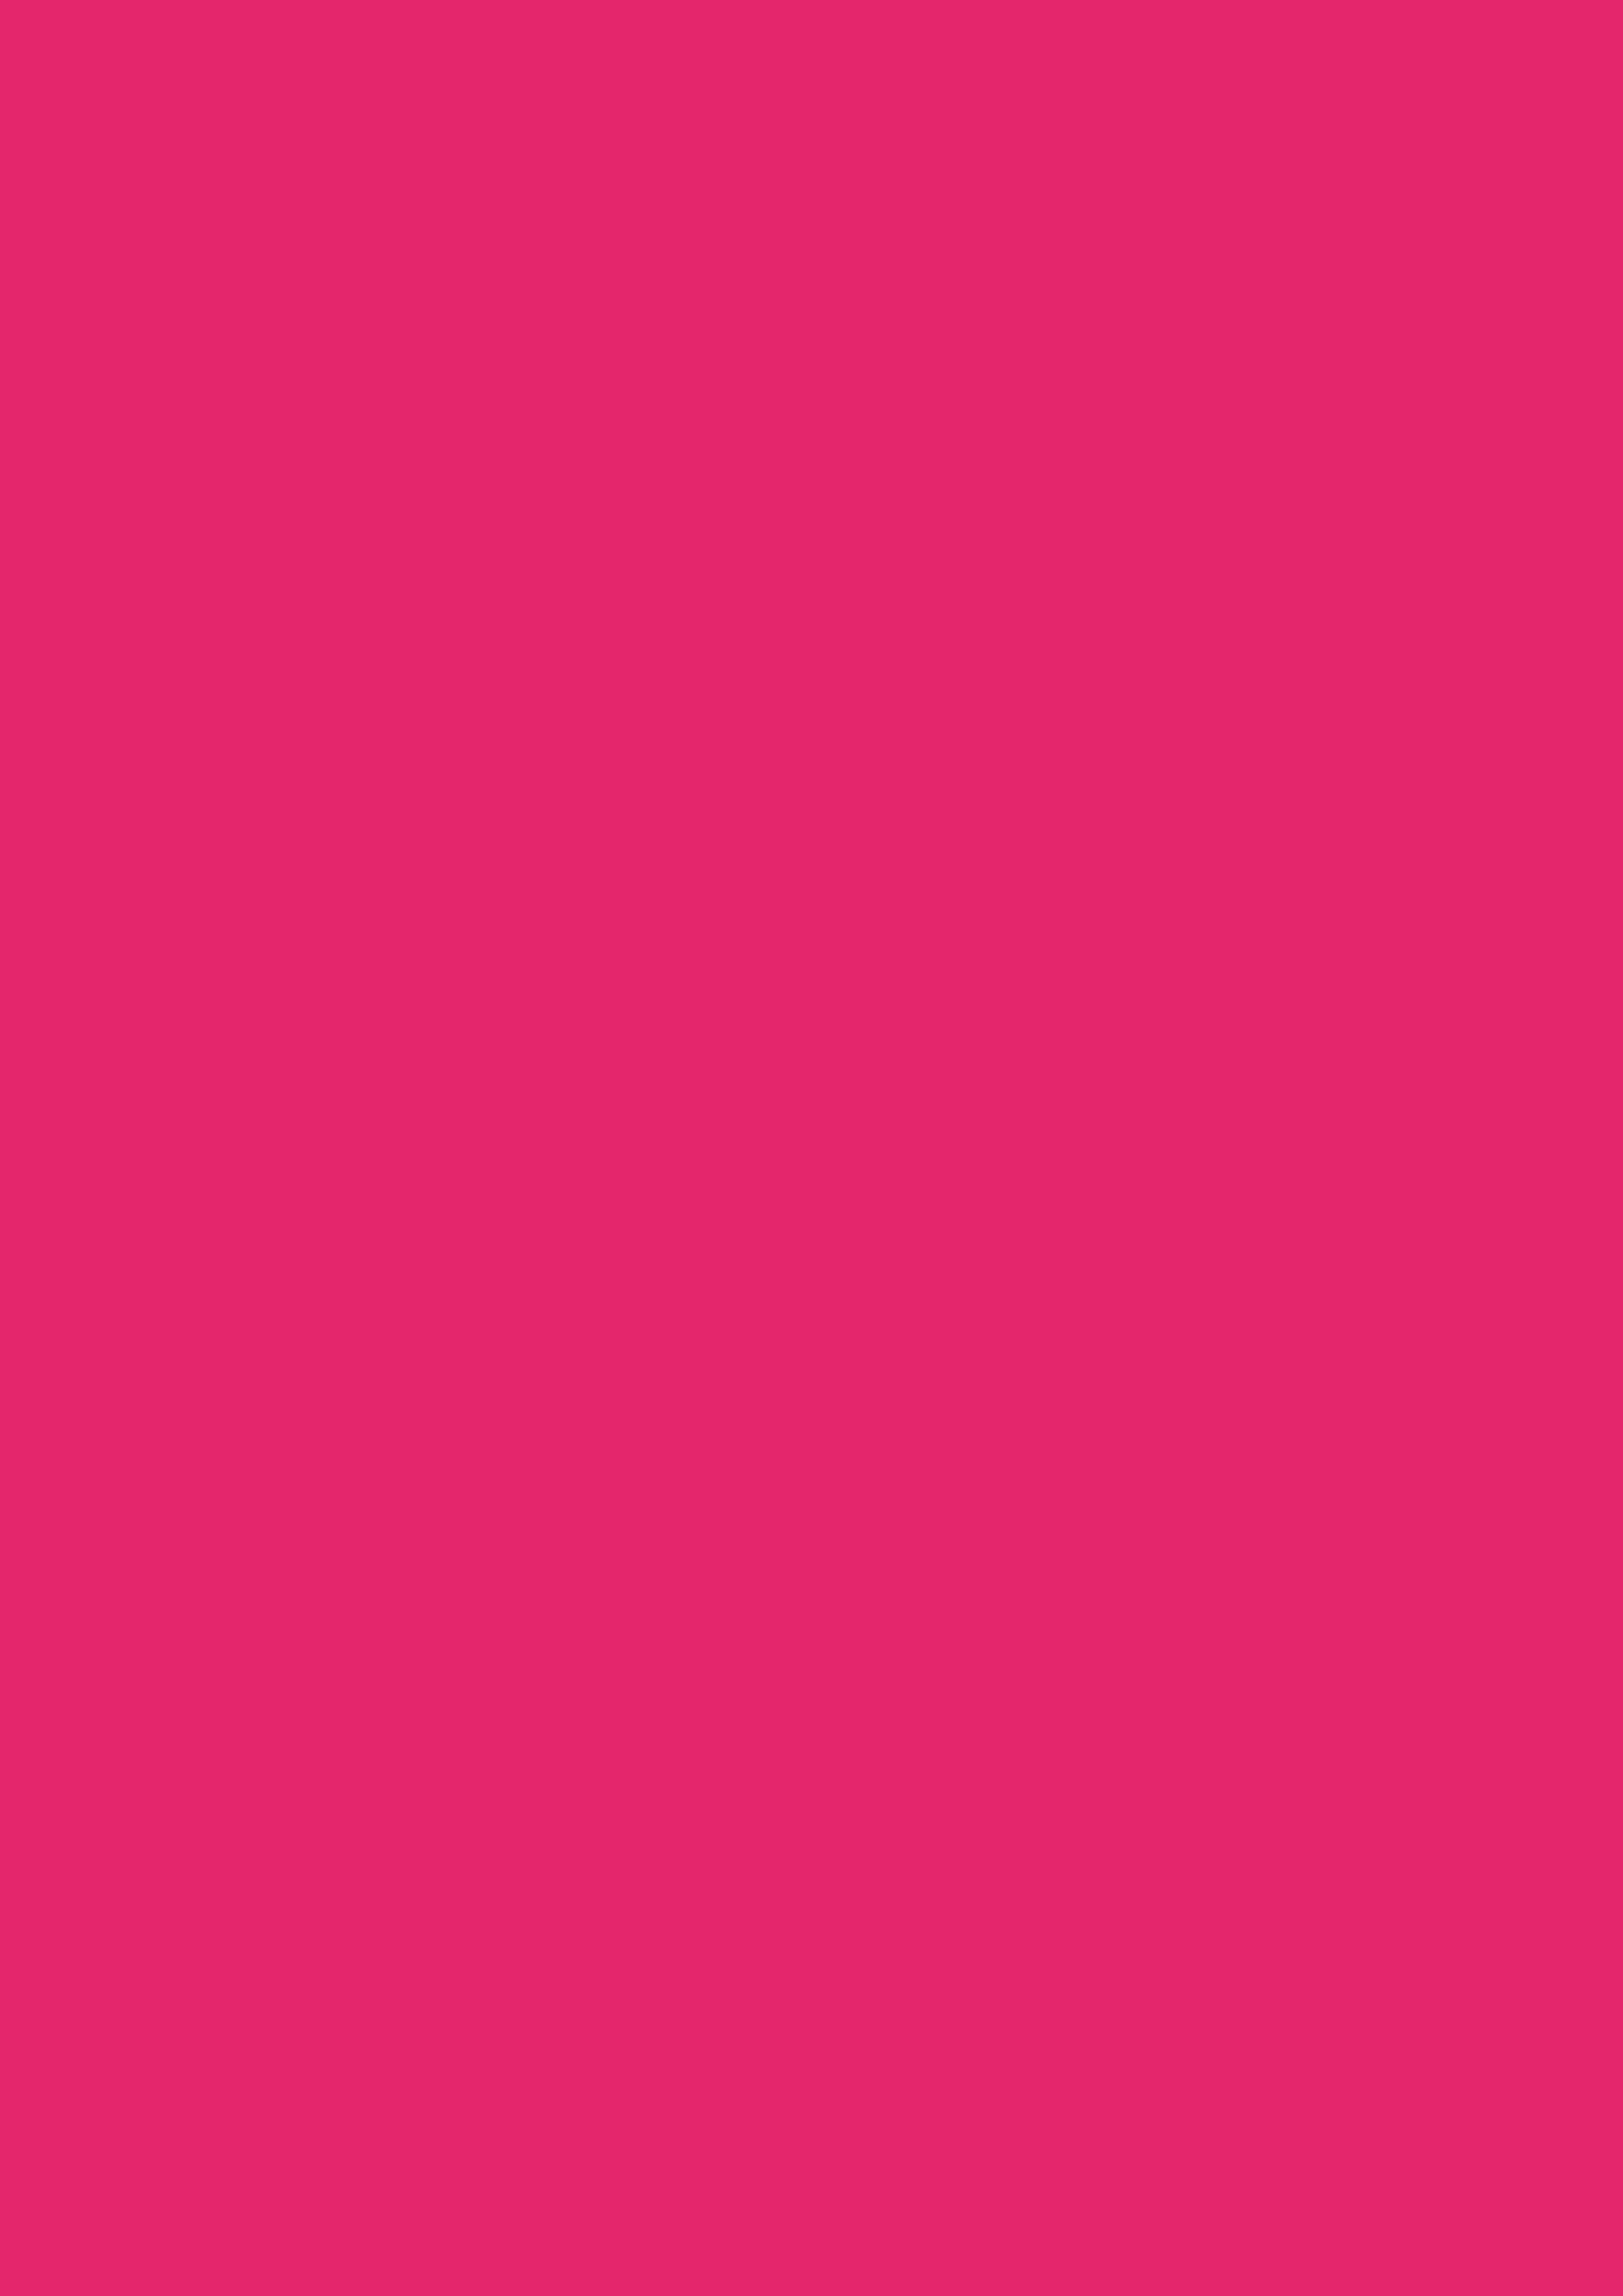 2480x3508 Razzmatazz Solid Color Background